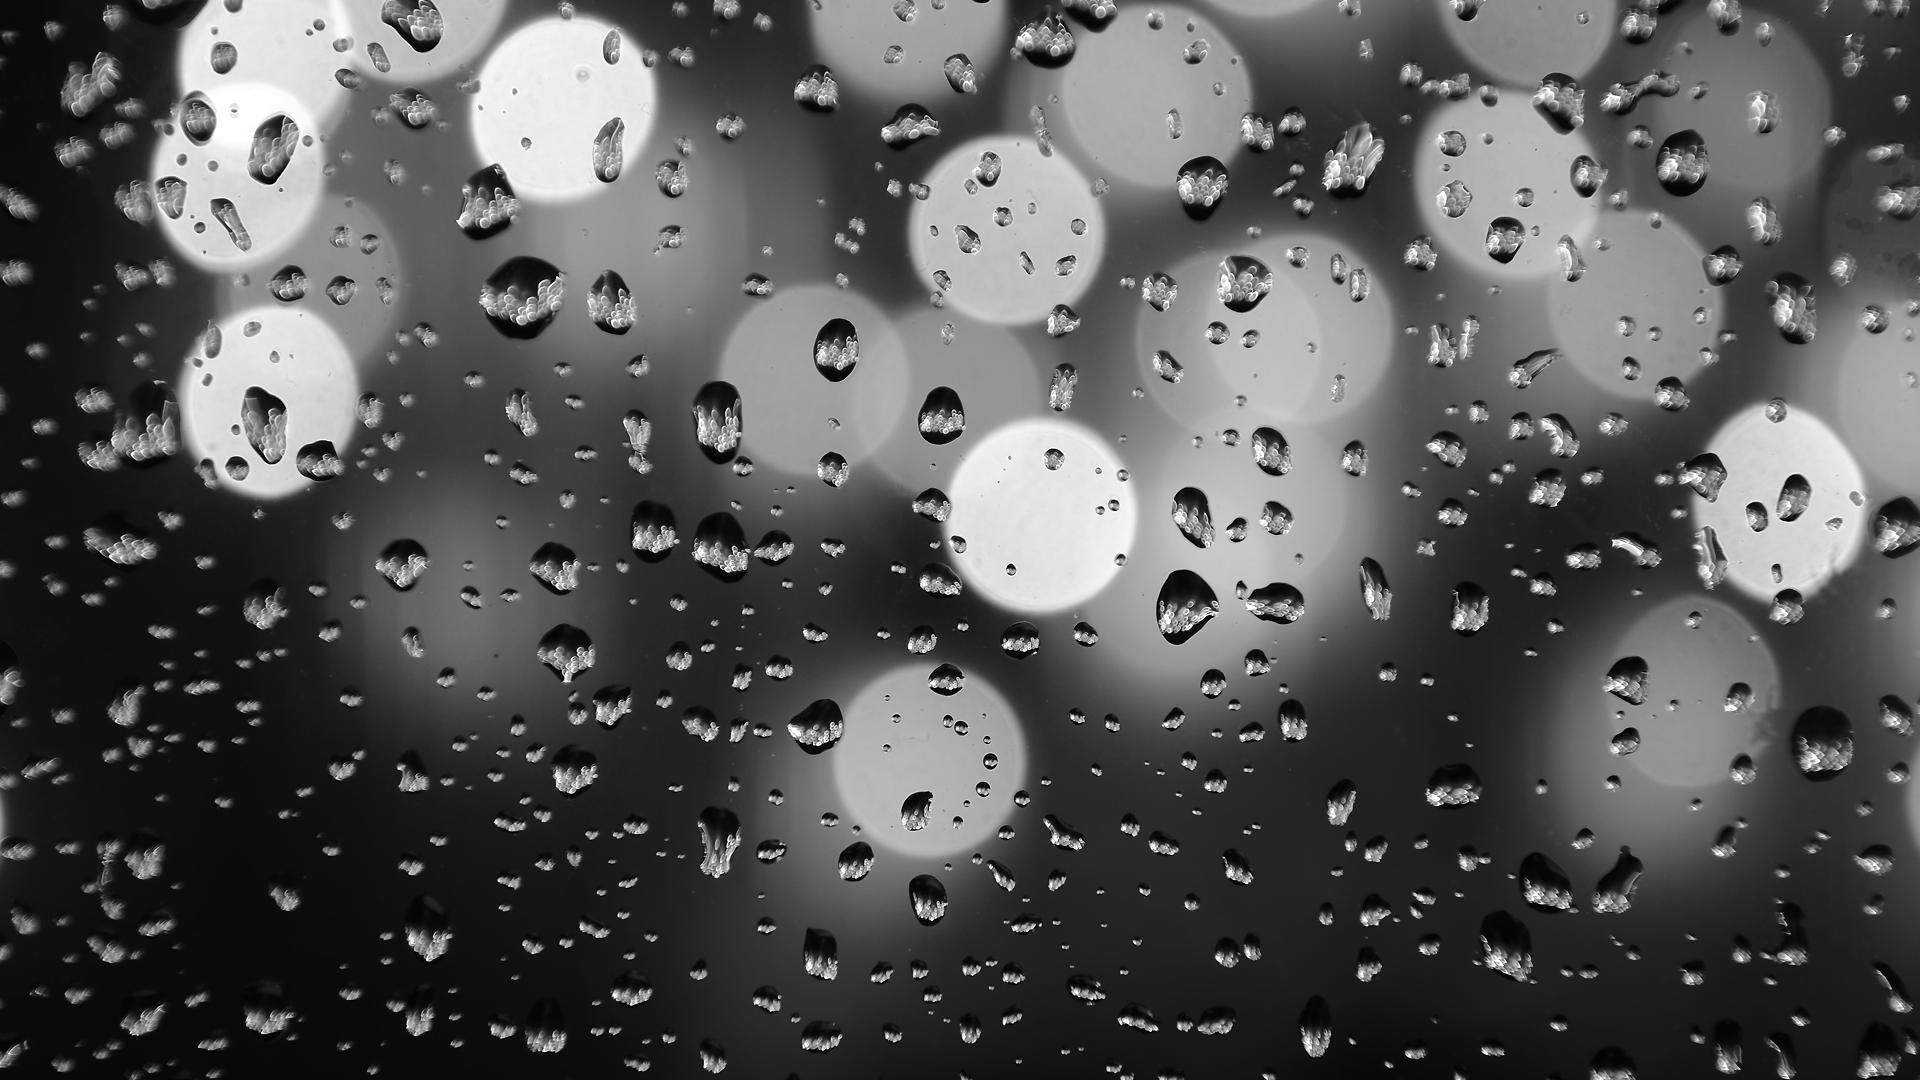 Rain Hd Wallpaper 77 Pictures